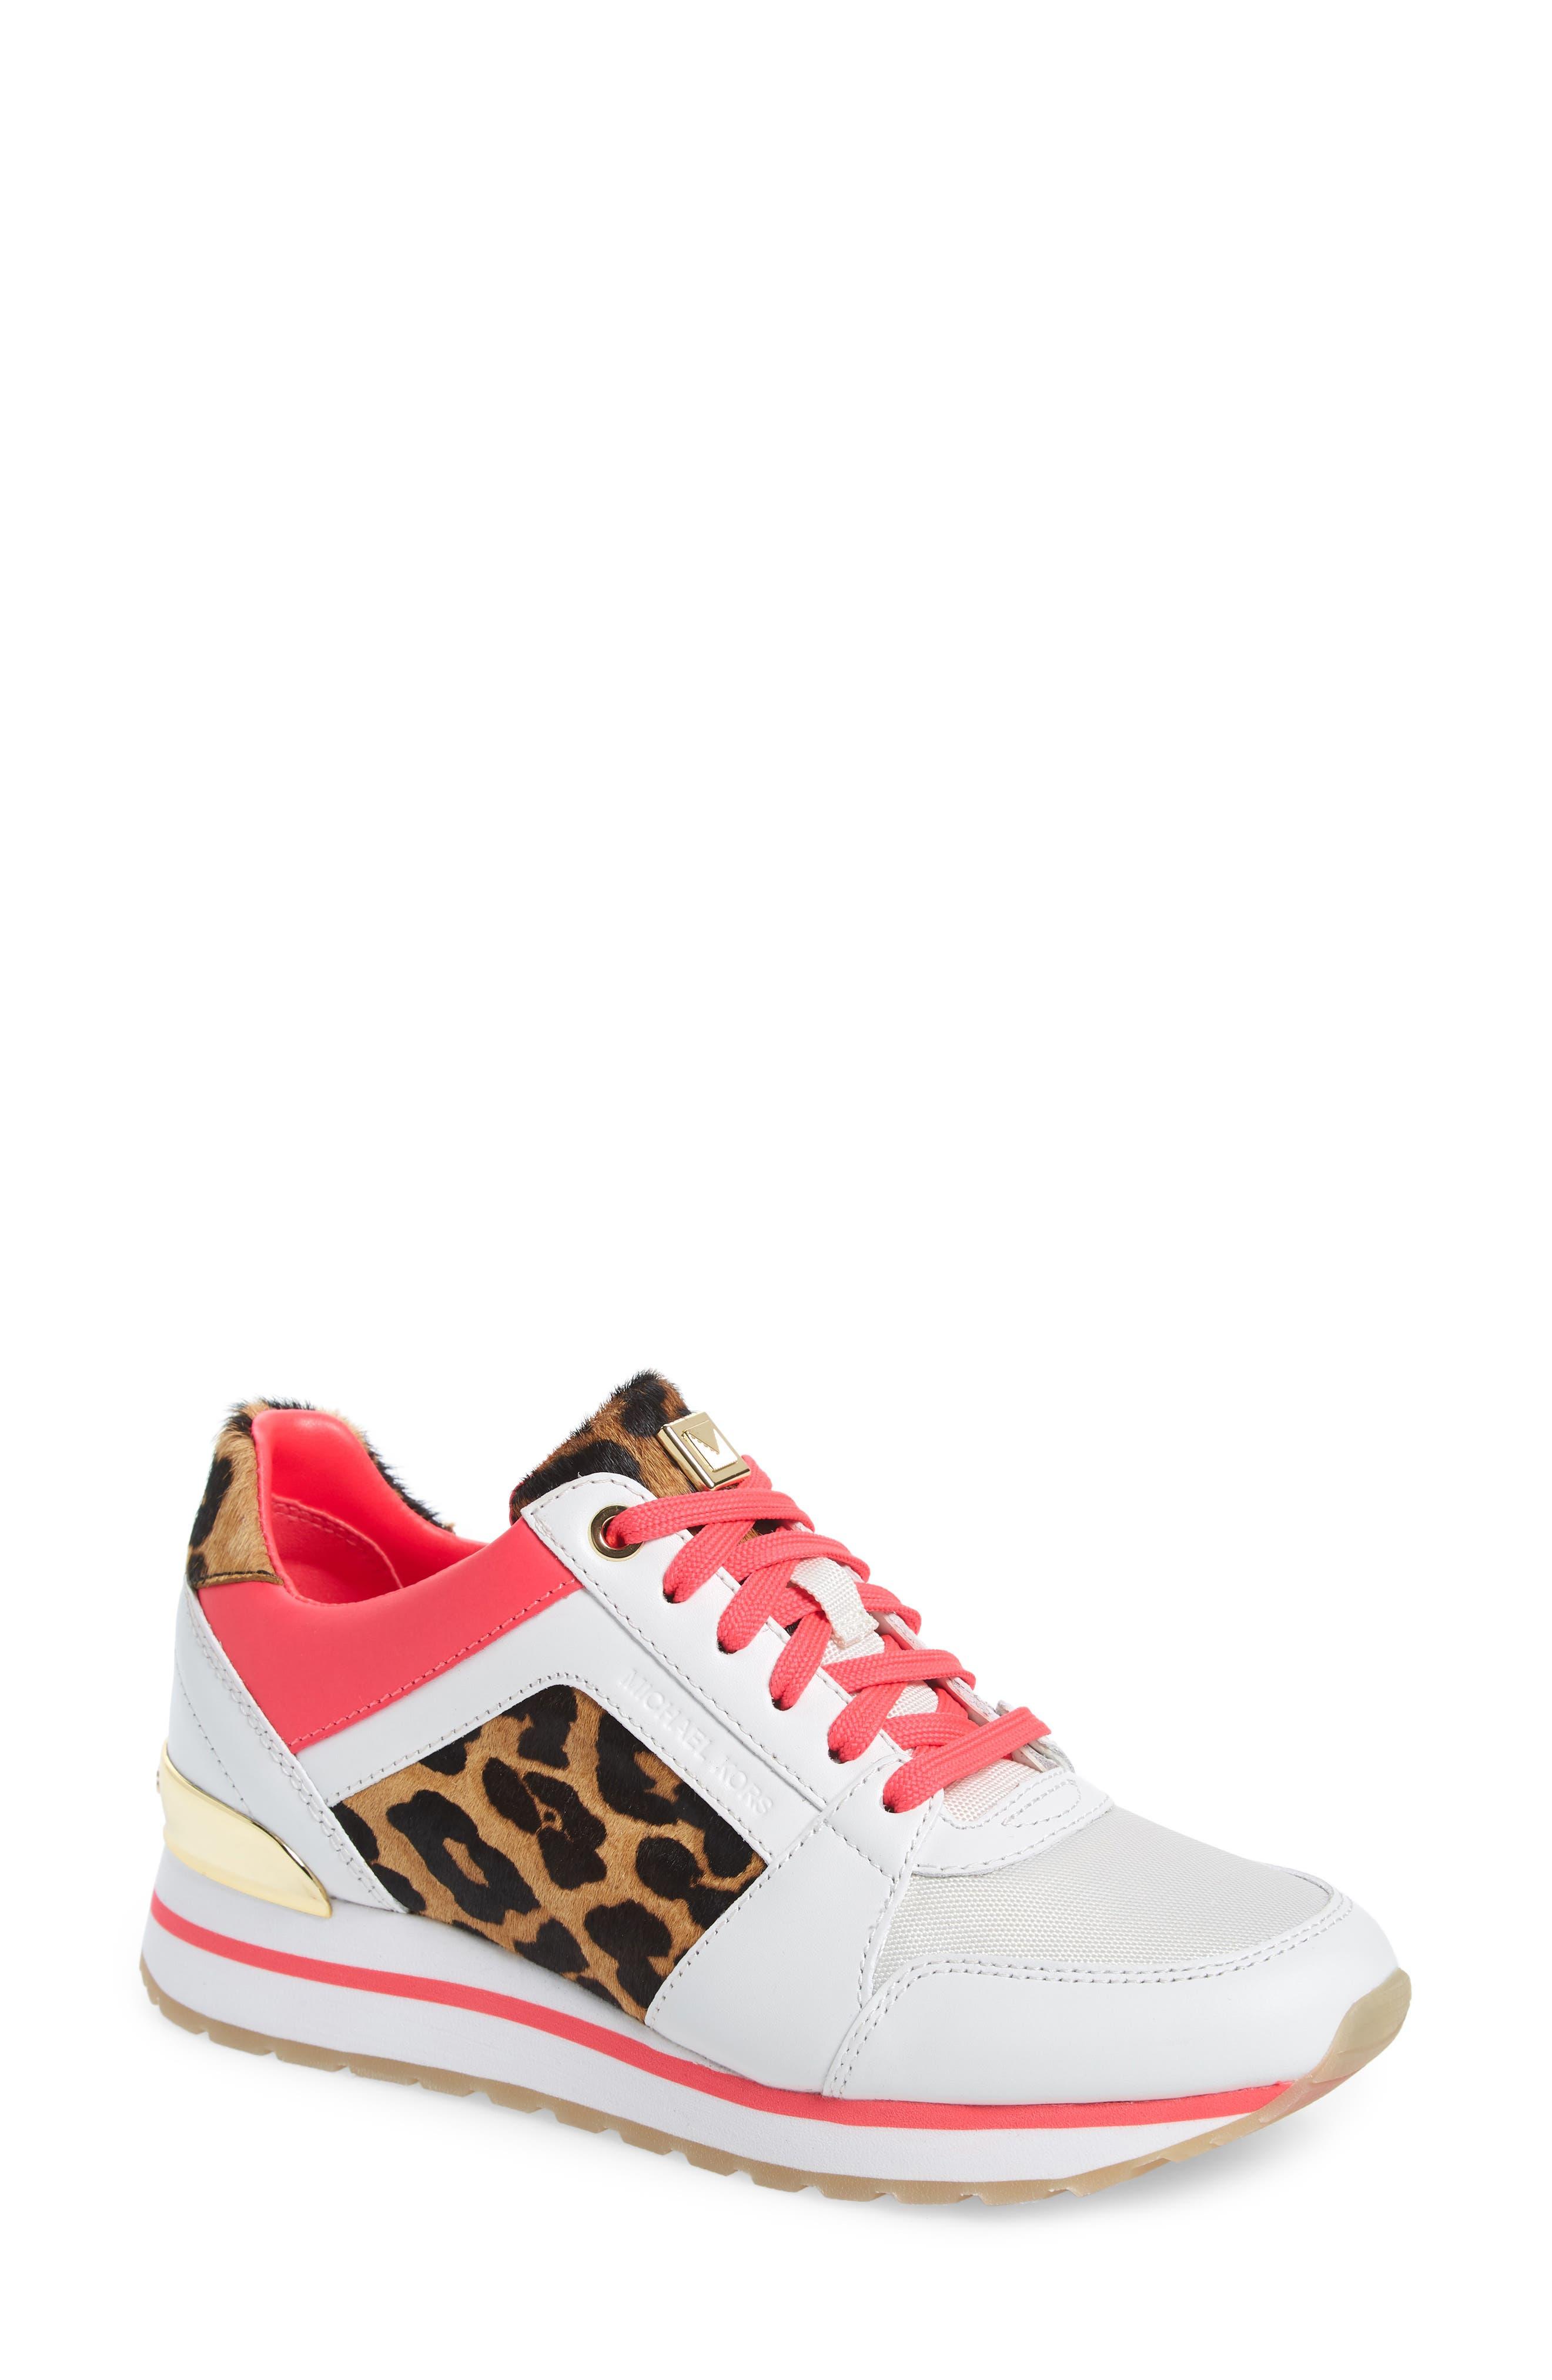 Michael Michael Kors Billie Perforated Sneaker, White